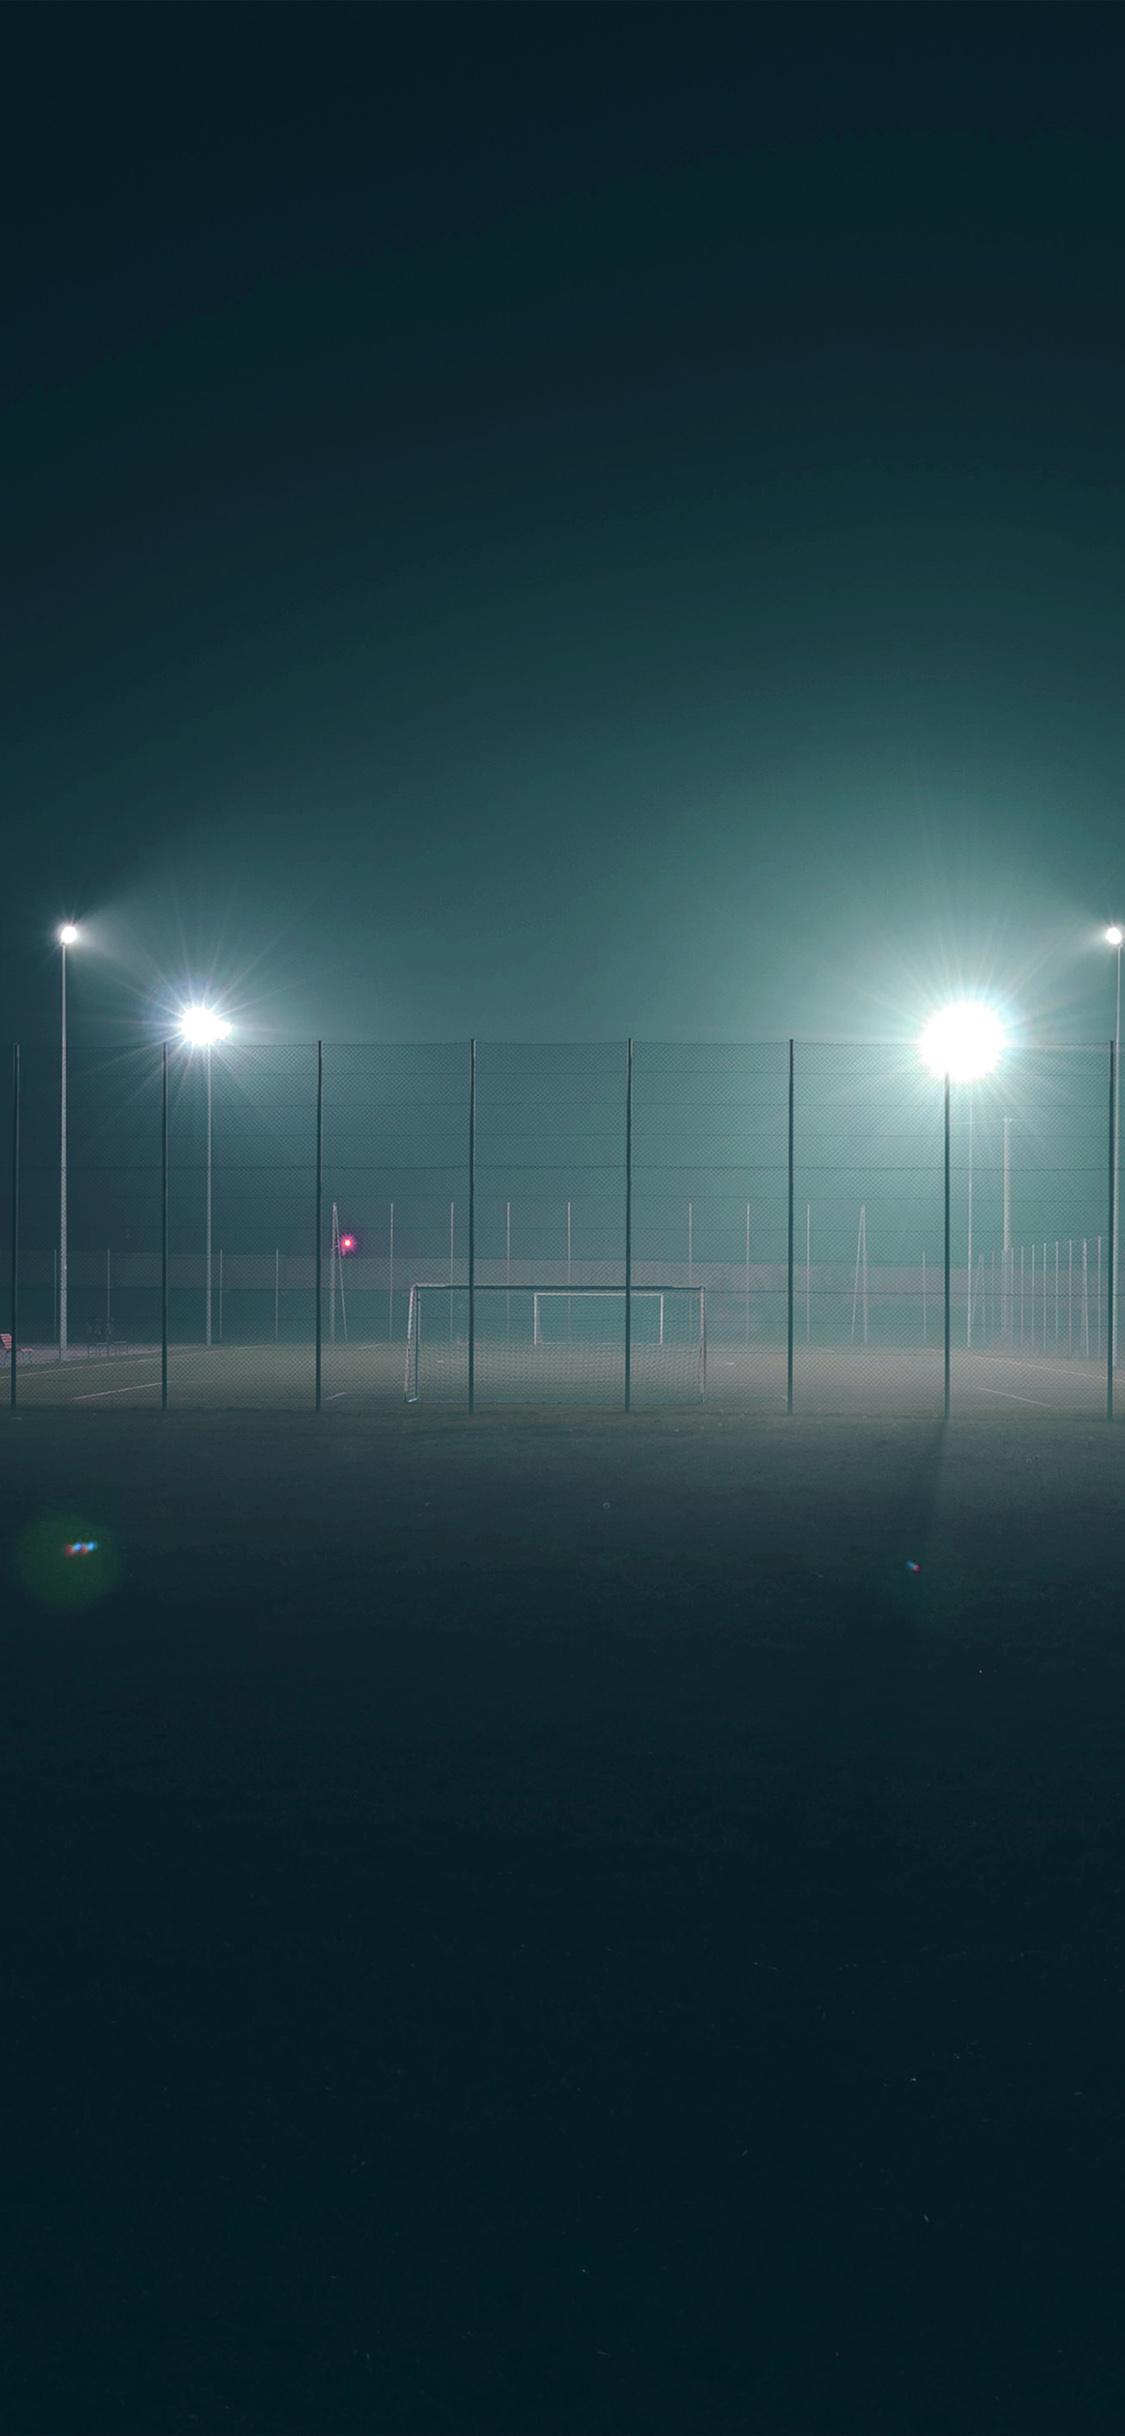 iPhonexpapers.com-Apple-iPhone-wallpaper-nn99-soccer-field-city-night-light-dark-green